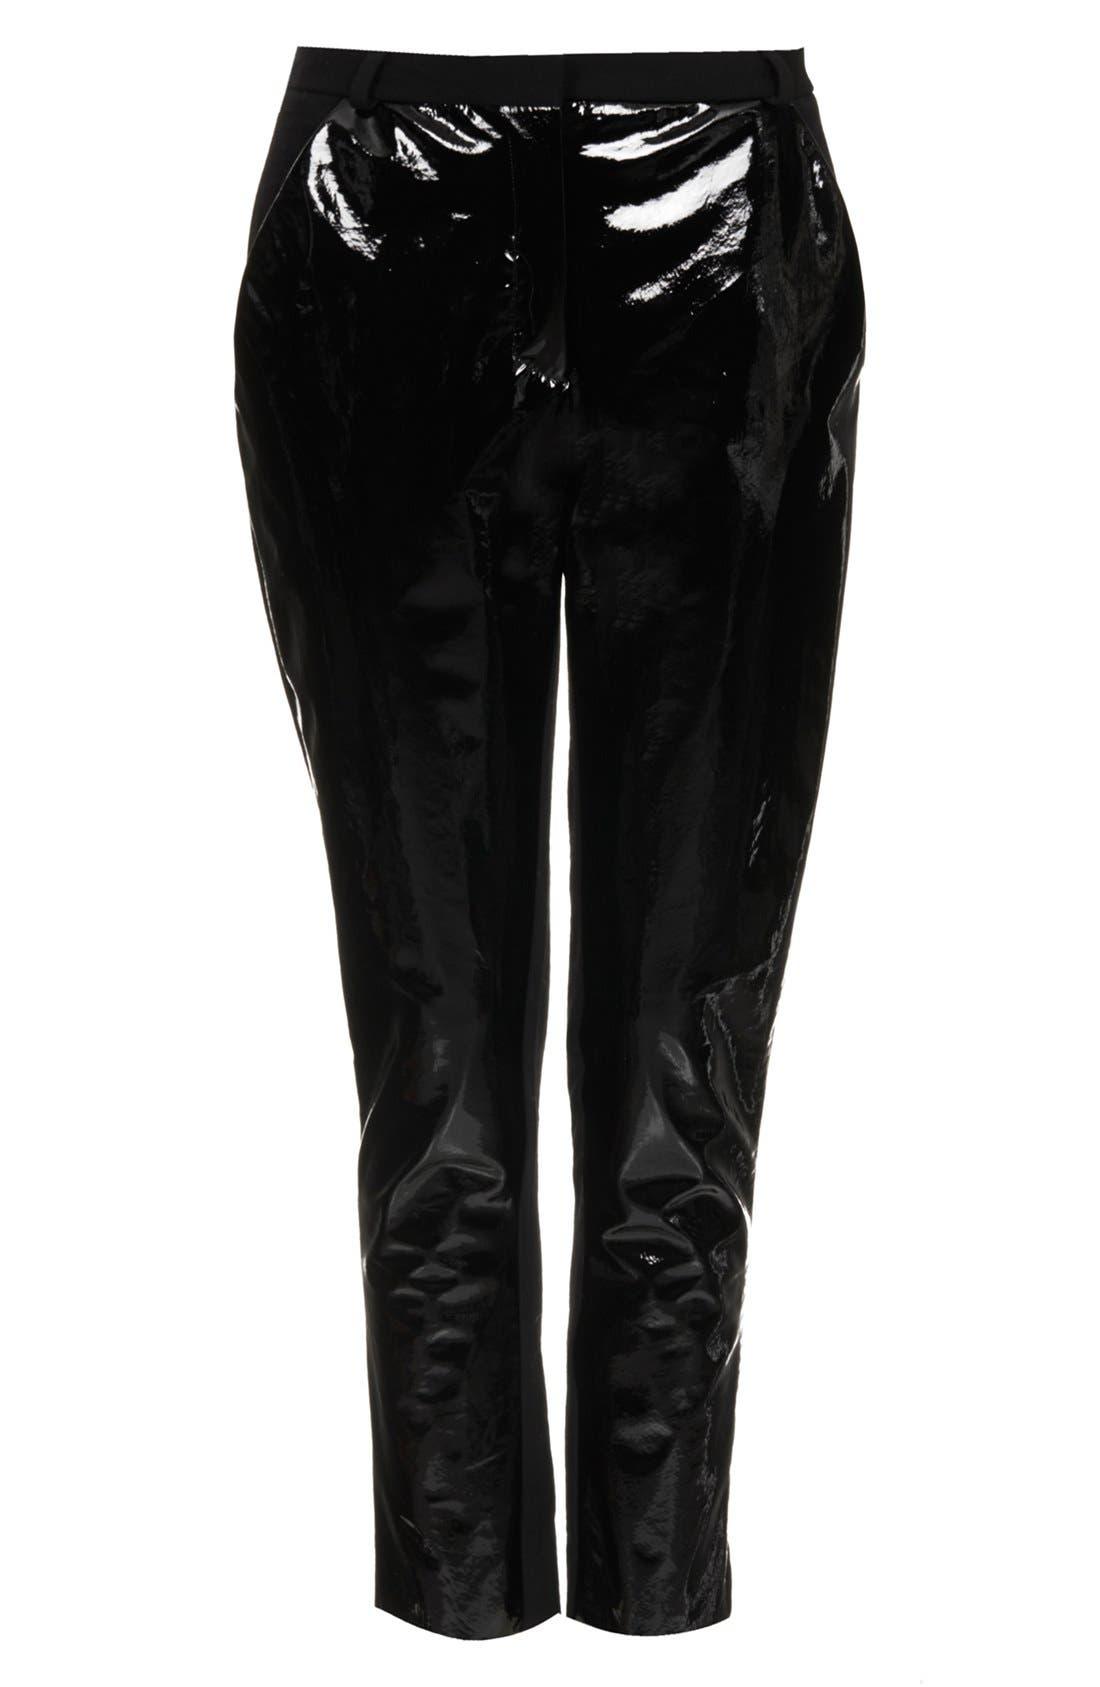 Topshop Patent Leather Panel Trousers,                             Alternate thumbnail 5, color,                             001